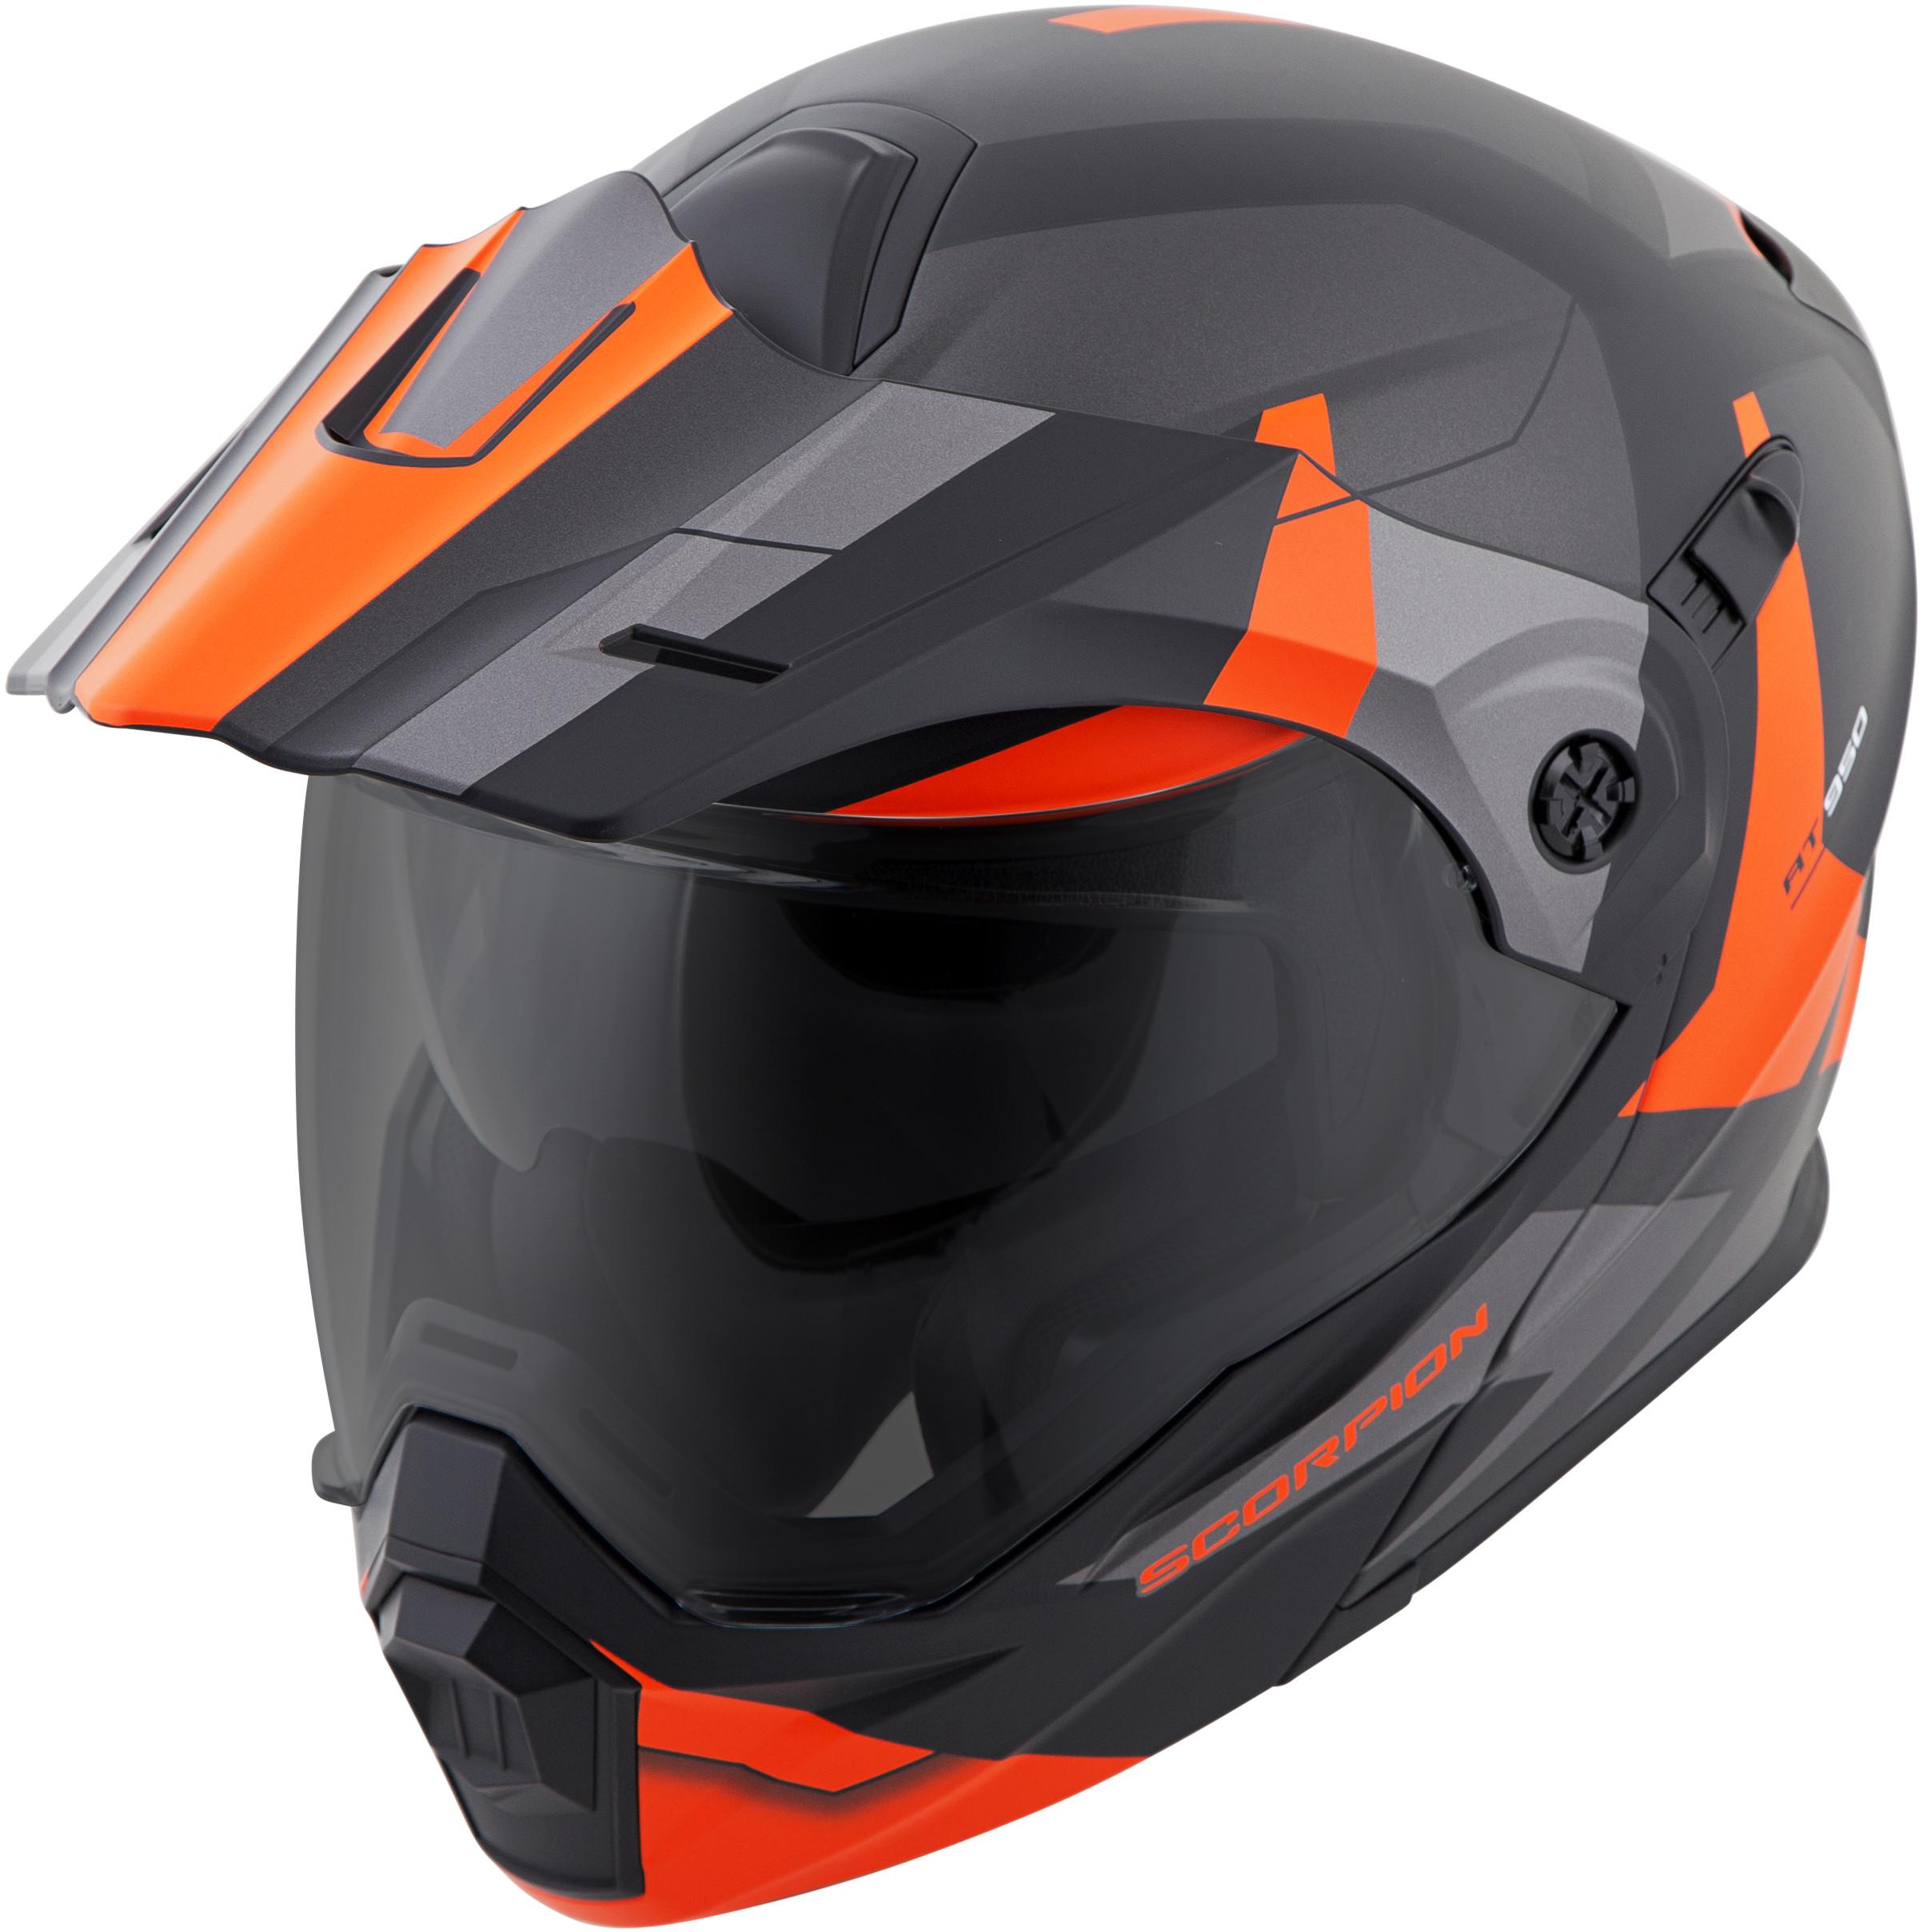 for-Scorpion-Helmet-EXO-AT950-Neocon-Snow-Helmet-with-Dual-Lens-Shield miniature 15